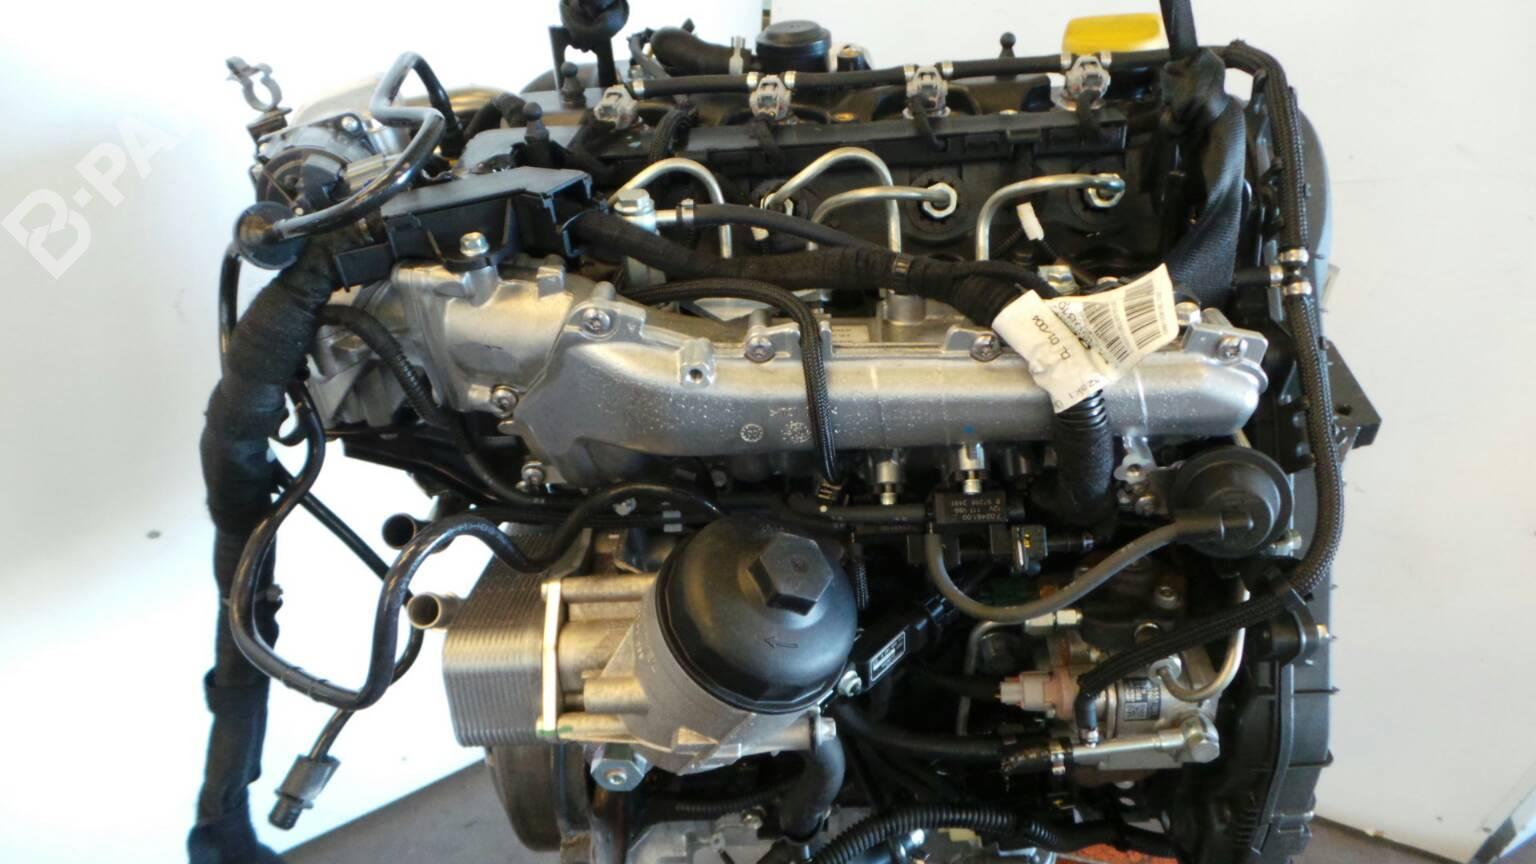 Engine Opel Astra H Saloon A04 17 Cdti 123780 Fuse Box Interior Lights 2291827 Cdti4 Doors